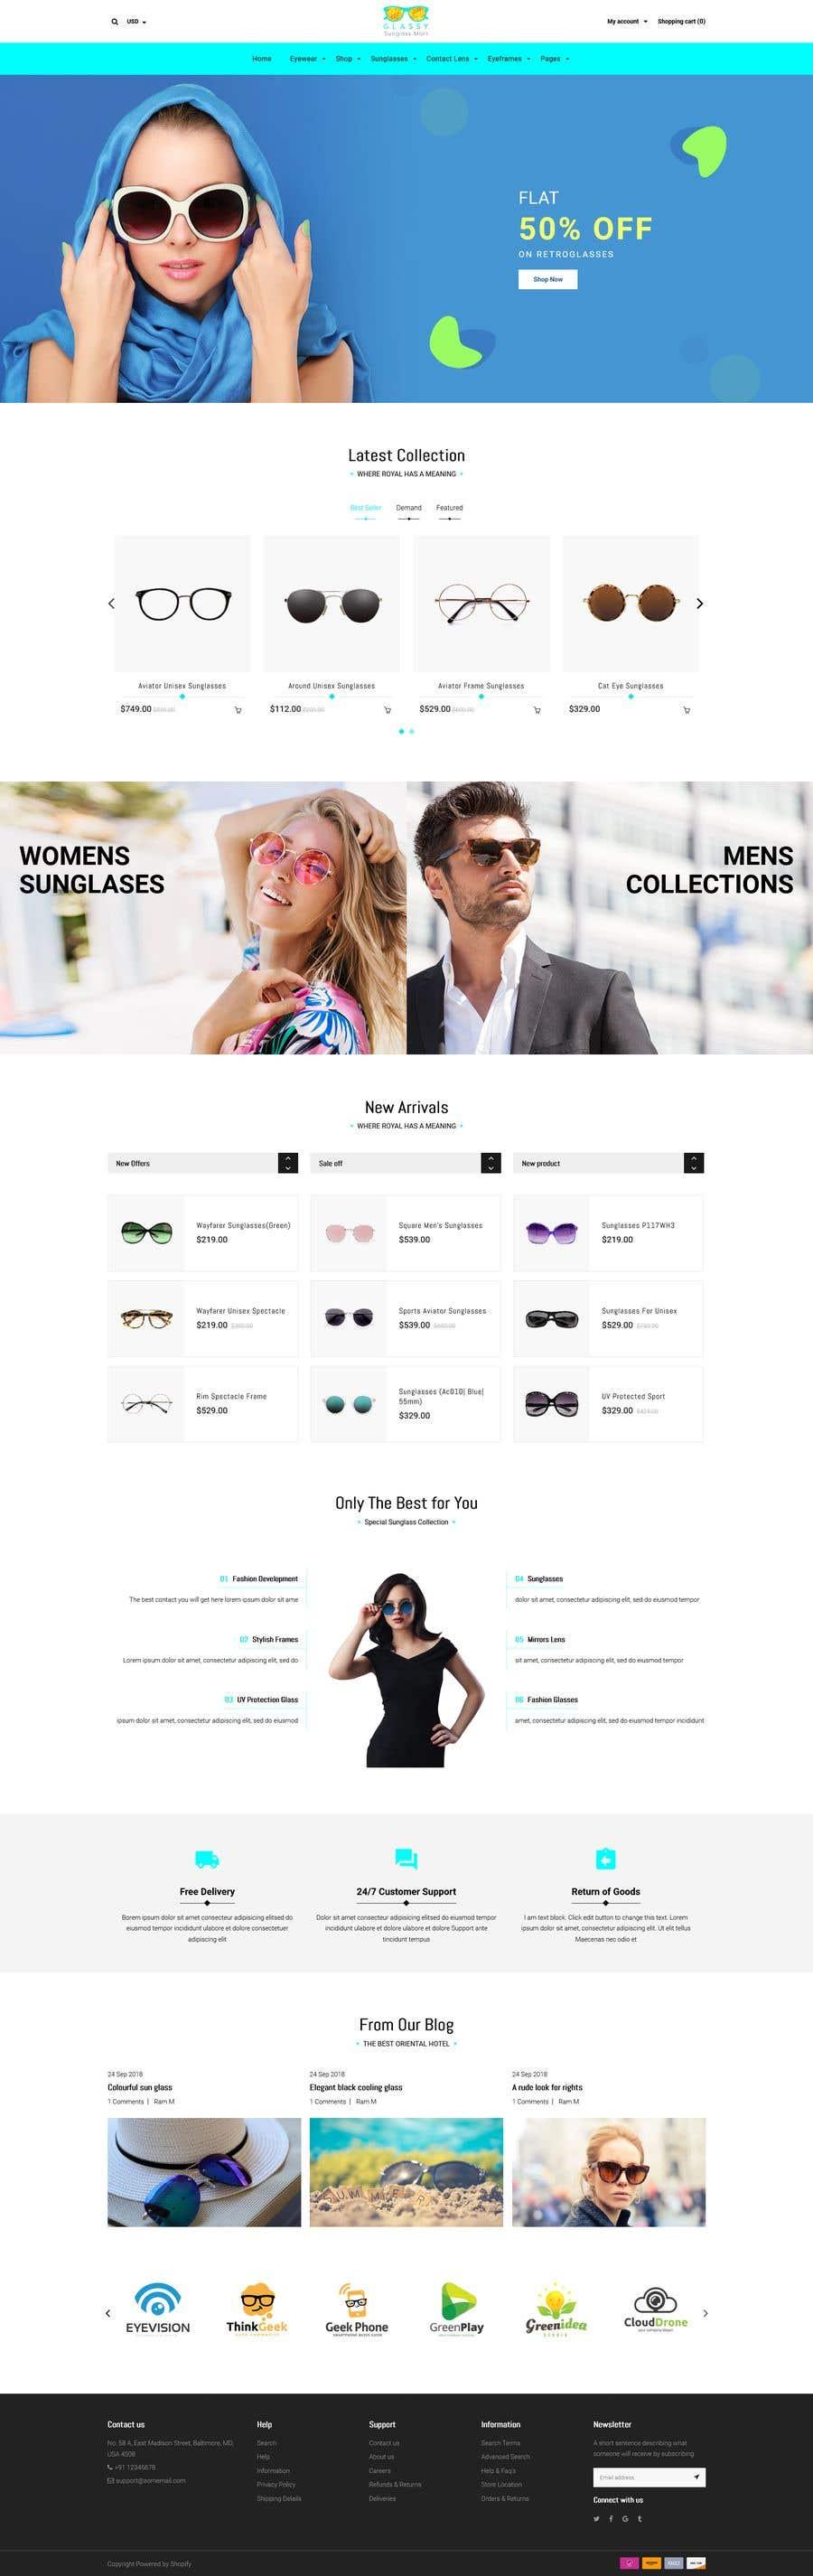 Konkurrenceindlæg #                                        52                                      for                                         Design an online shopping page for my website